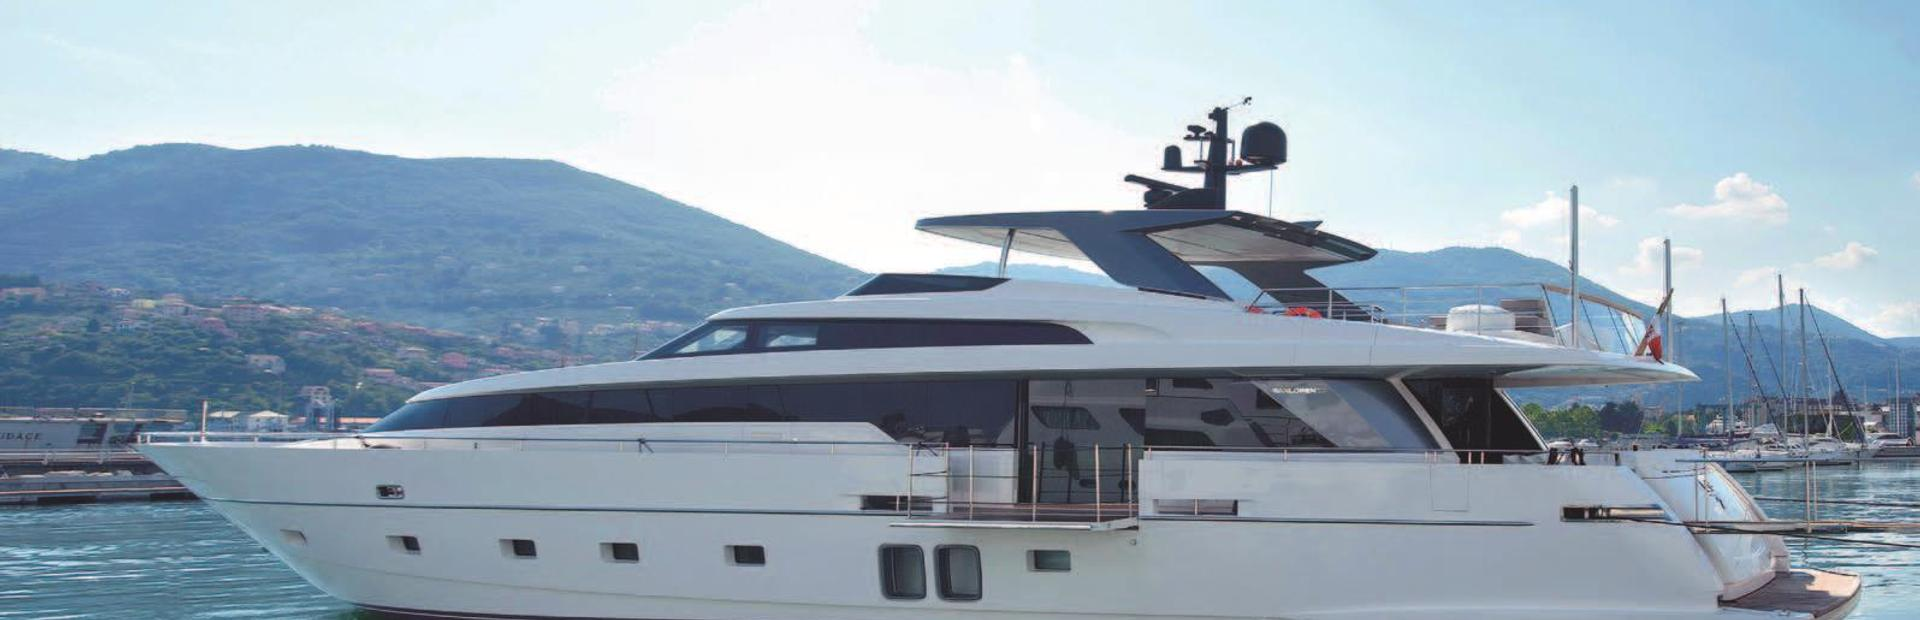 SL94 Yacht Charter